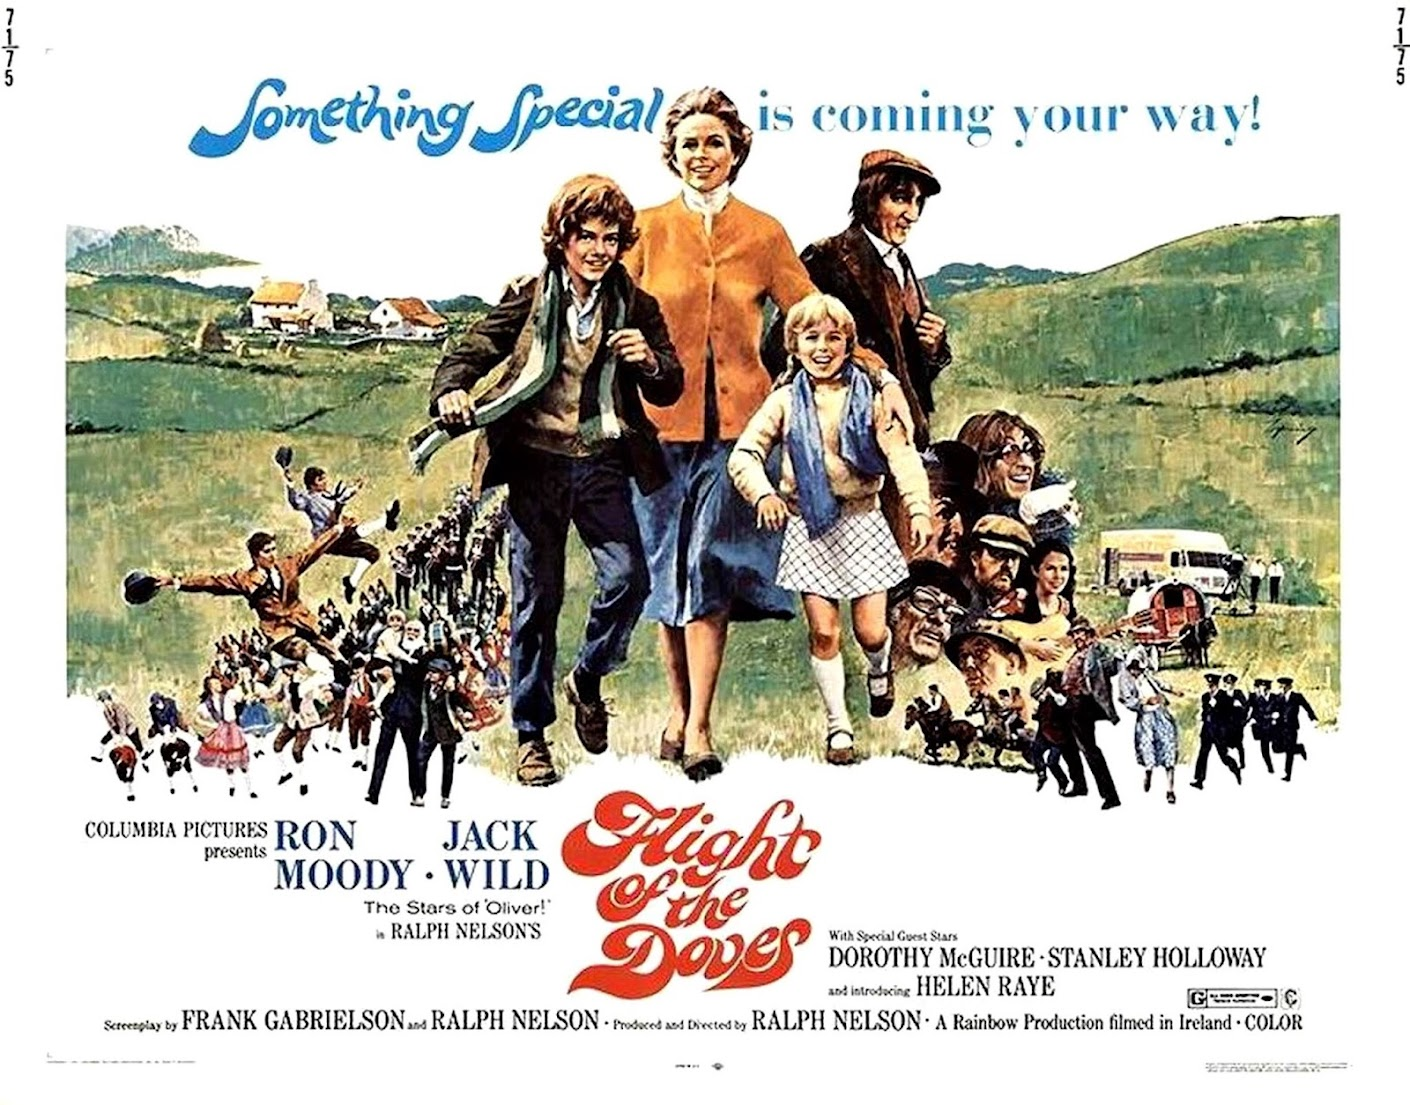 Flight of the doves (1970) Ralph Nelson - (Inédit en France) (20.07.1970 / 09.1970)